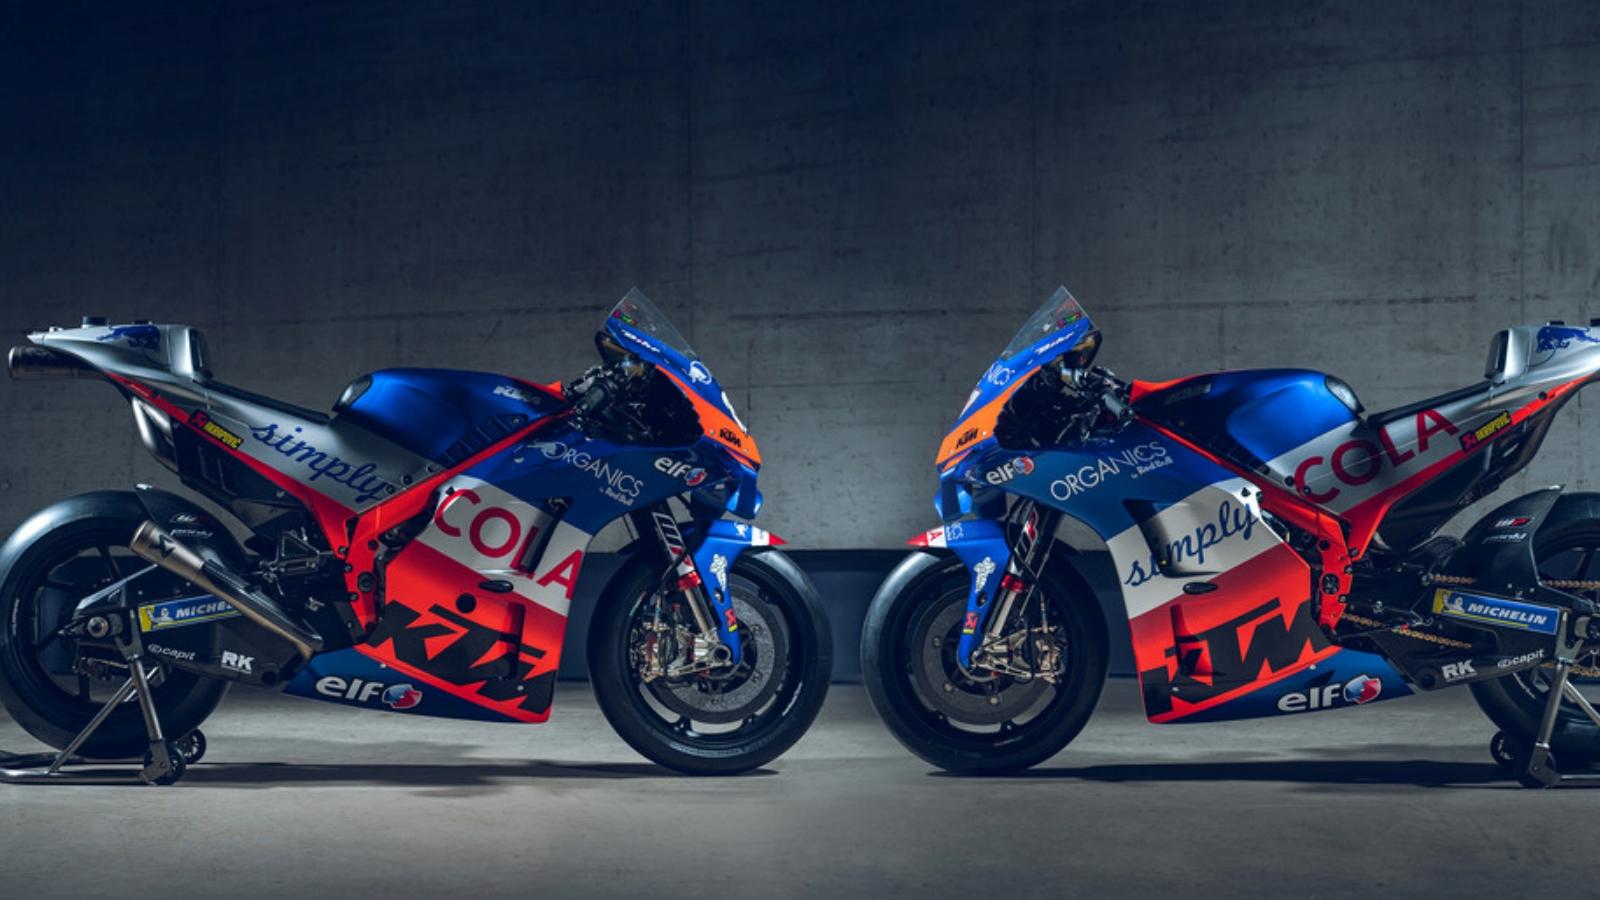 La KTM RC16 Tech 3 de Miguel Oliveira e Iker Lecuona para MotoGP 2020